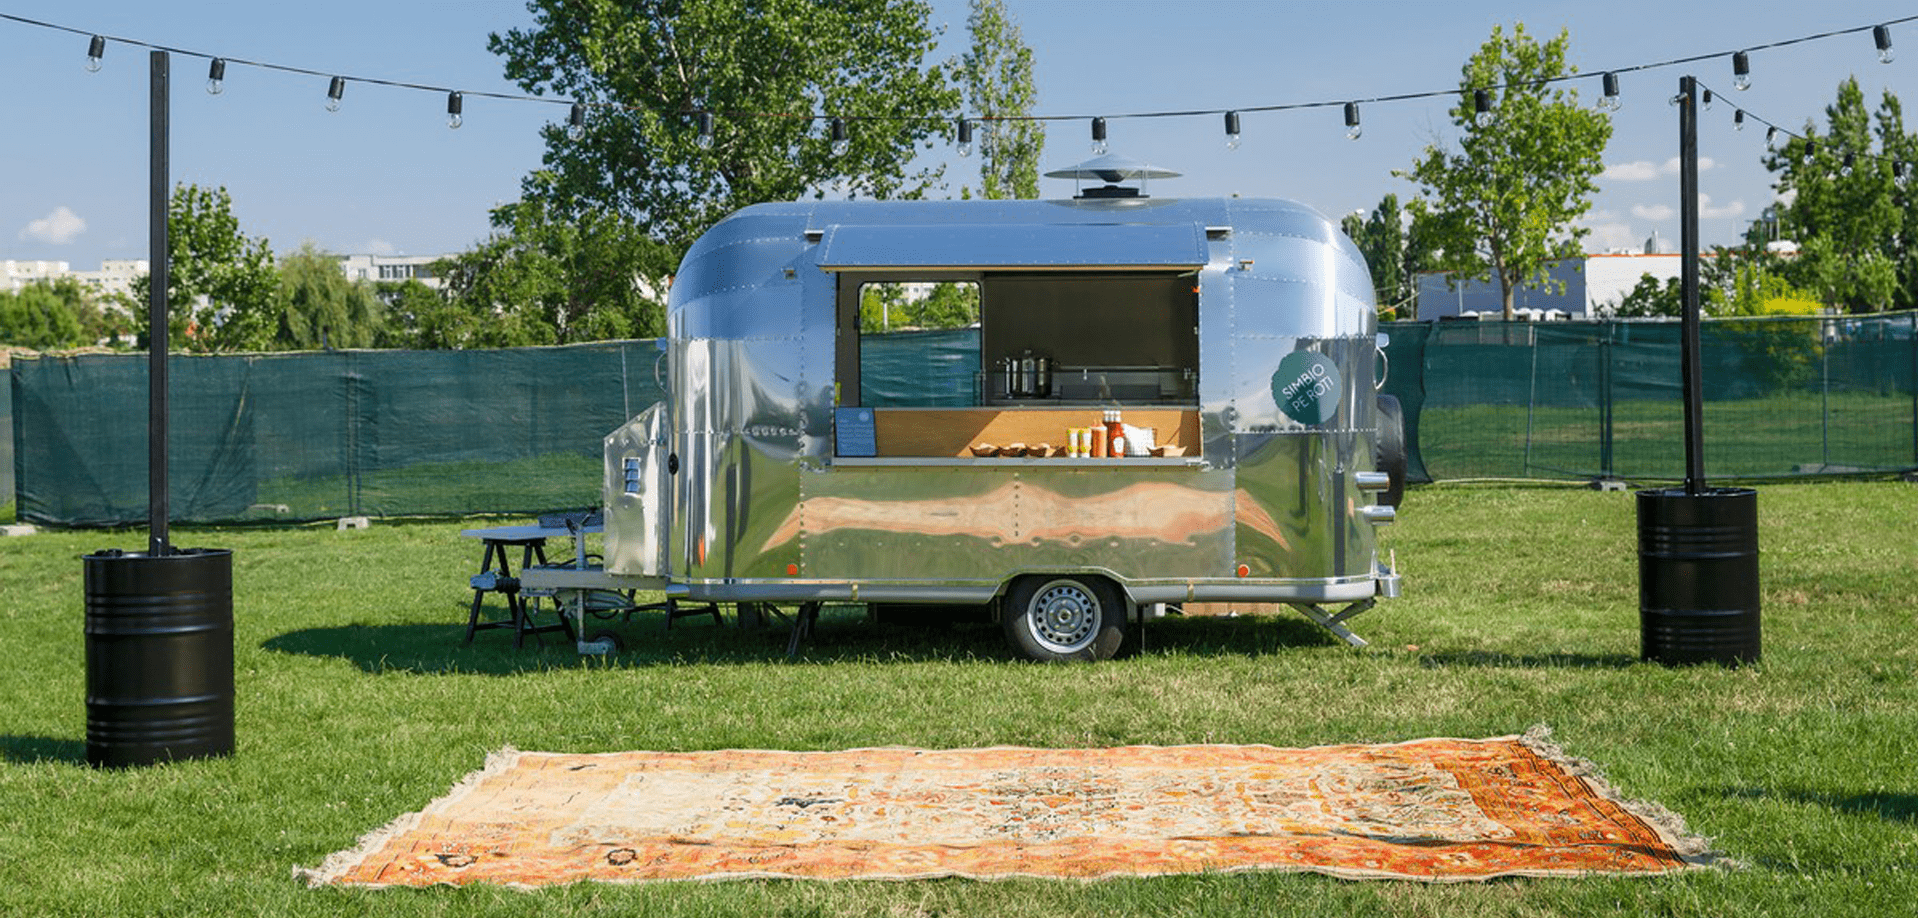 Simbio-pe-roti-food-truck